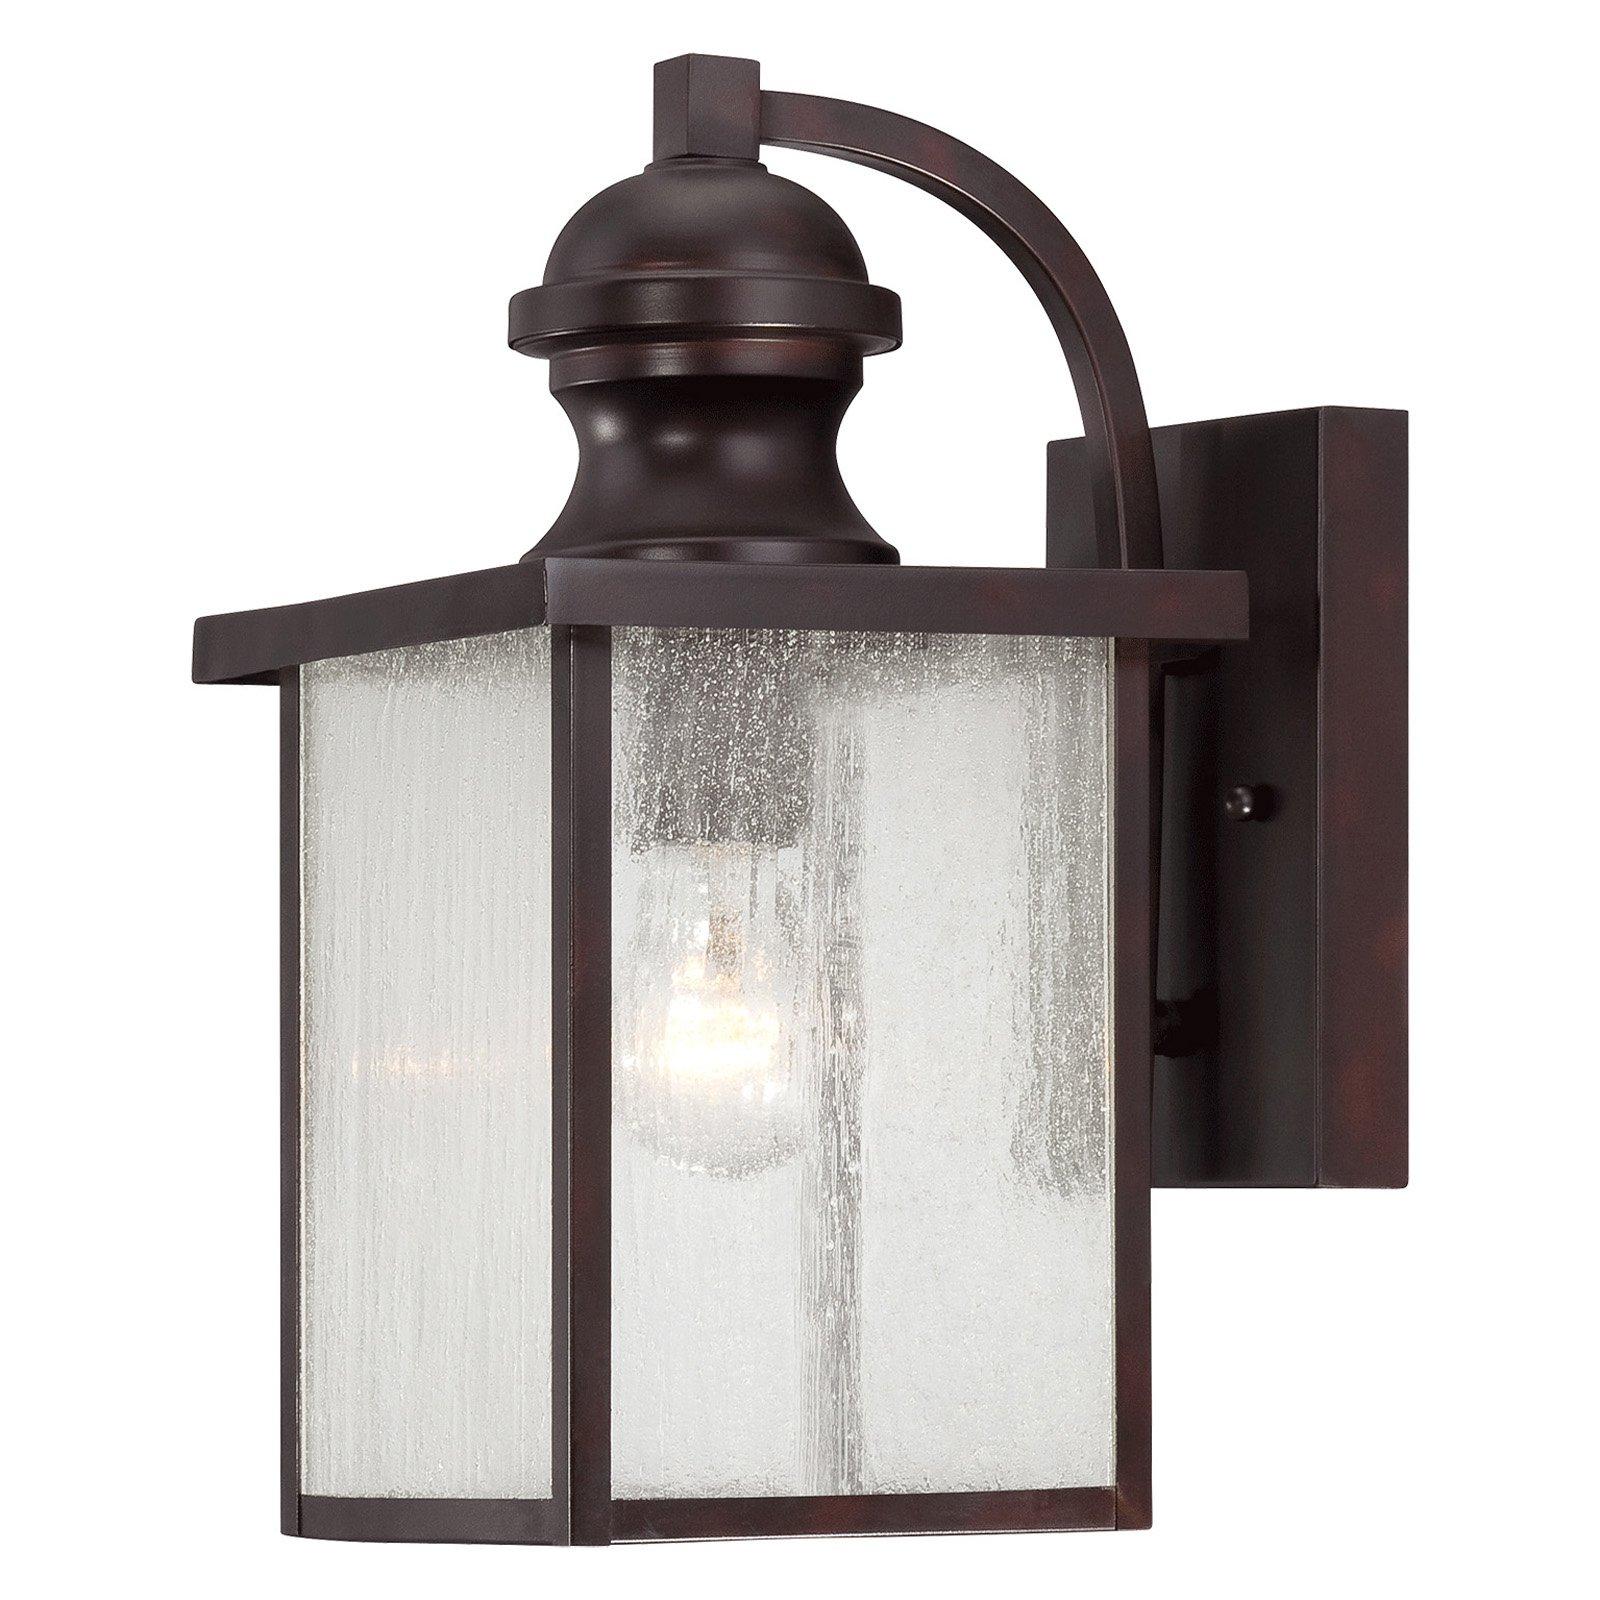 Savoy House Newberry 5-60 Outdoor Wall Lantern